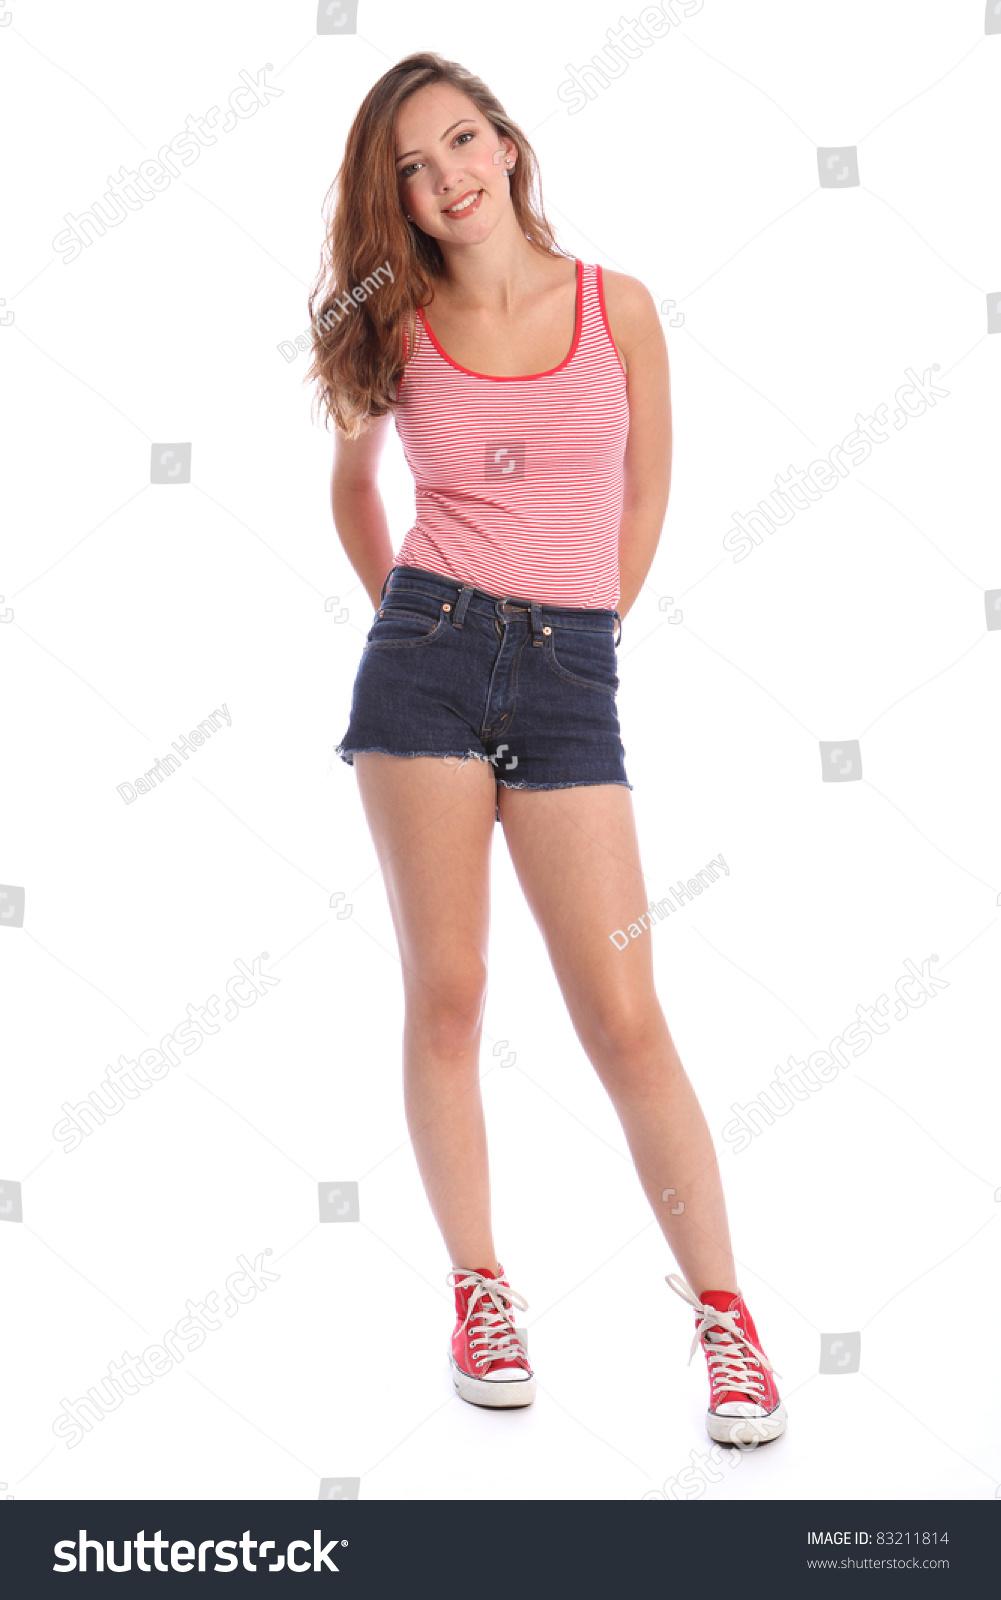 Young Teen Girls Shorts Images - Usseekcom-4267